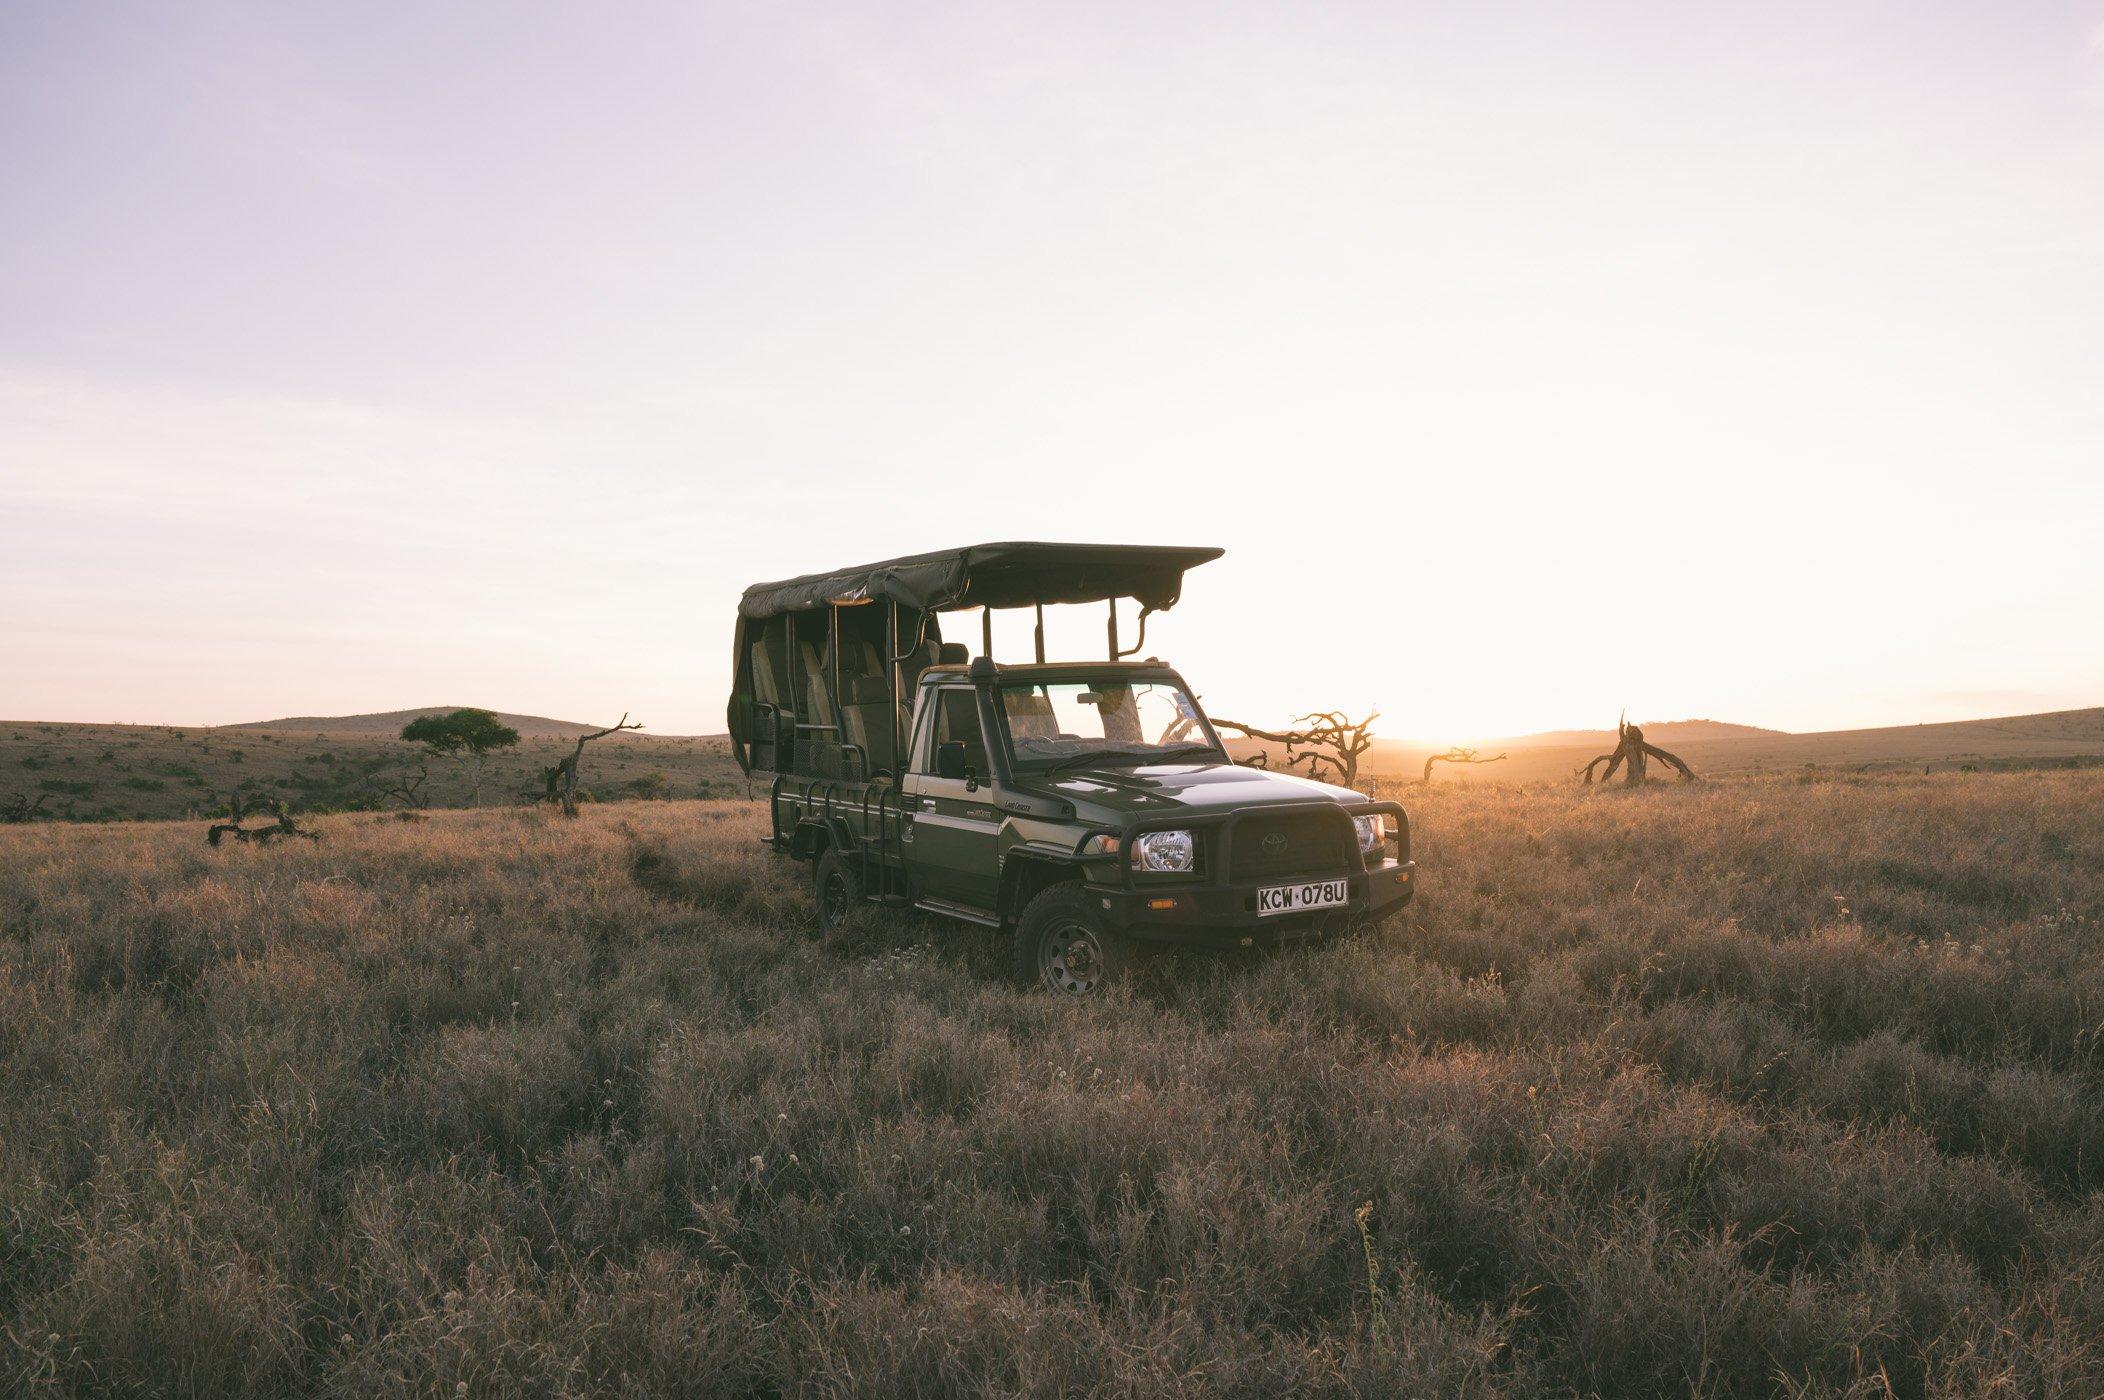 Sunrise at Lewa Wildlife Conservancy Kenya